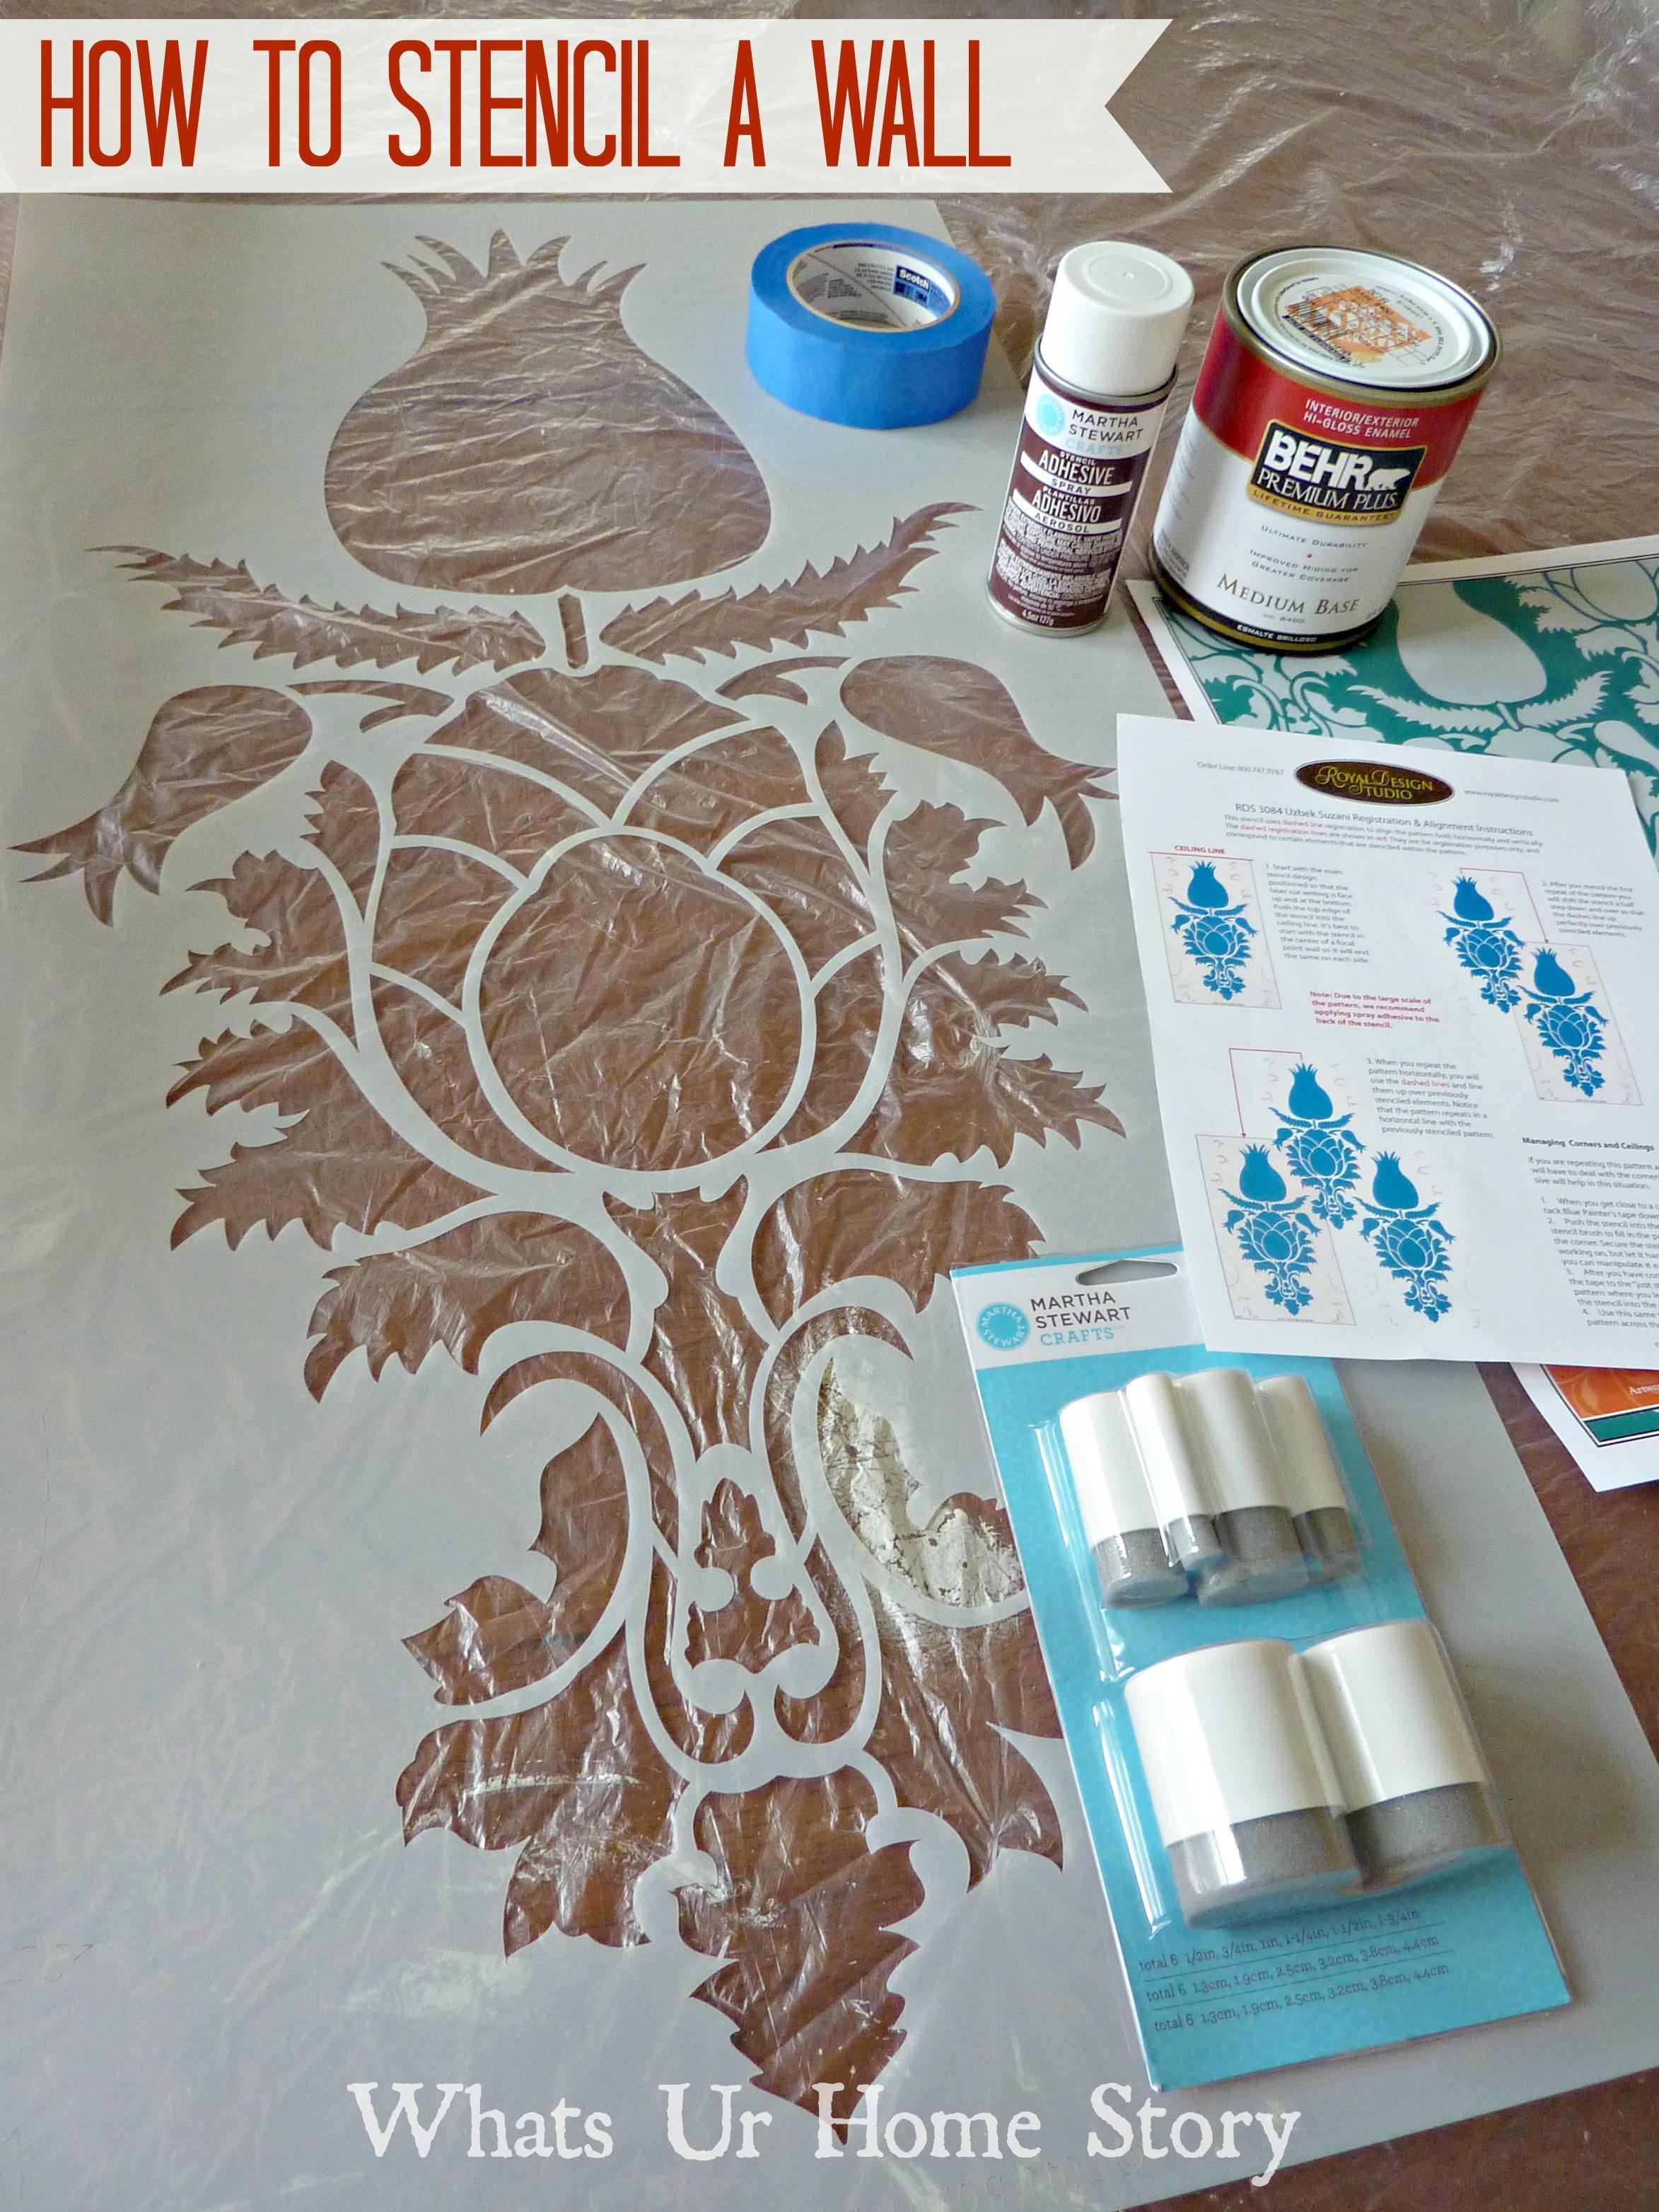 Wall Stencil,how stencil a wall,Uzbek Suzani Stencil,Royal Design Studio Stencil